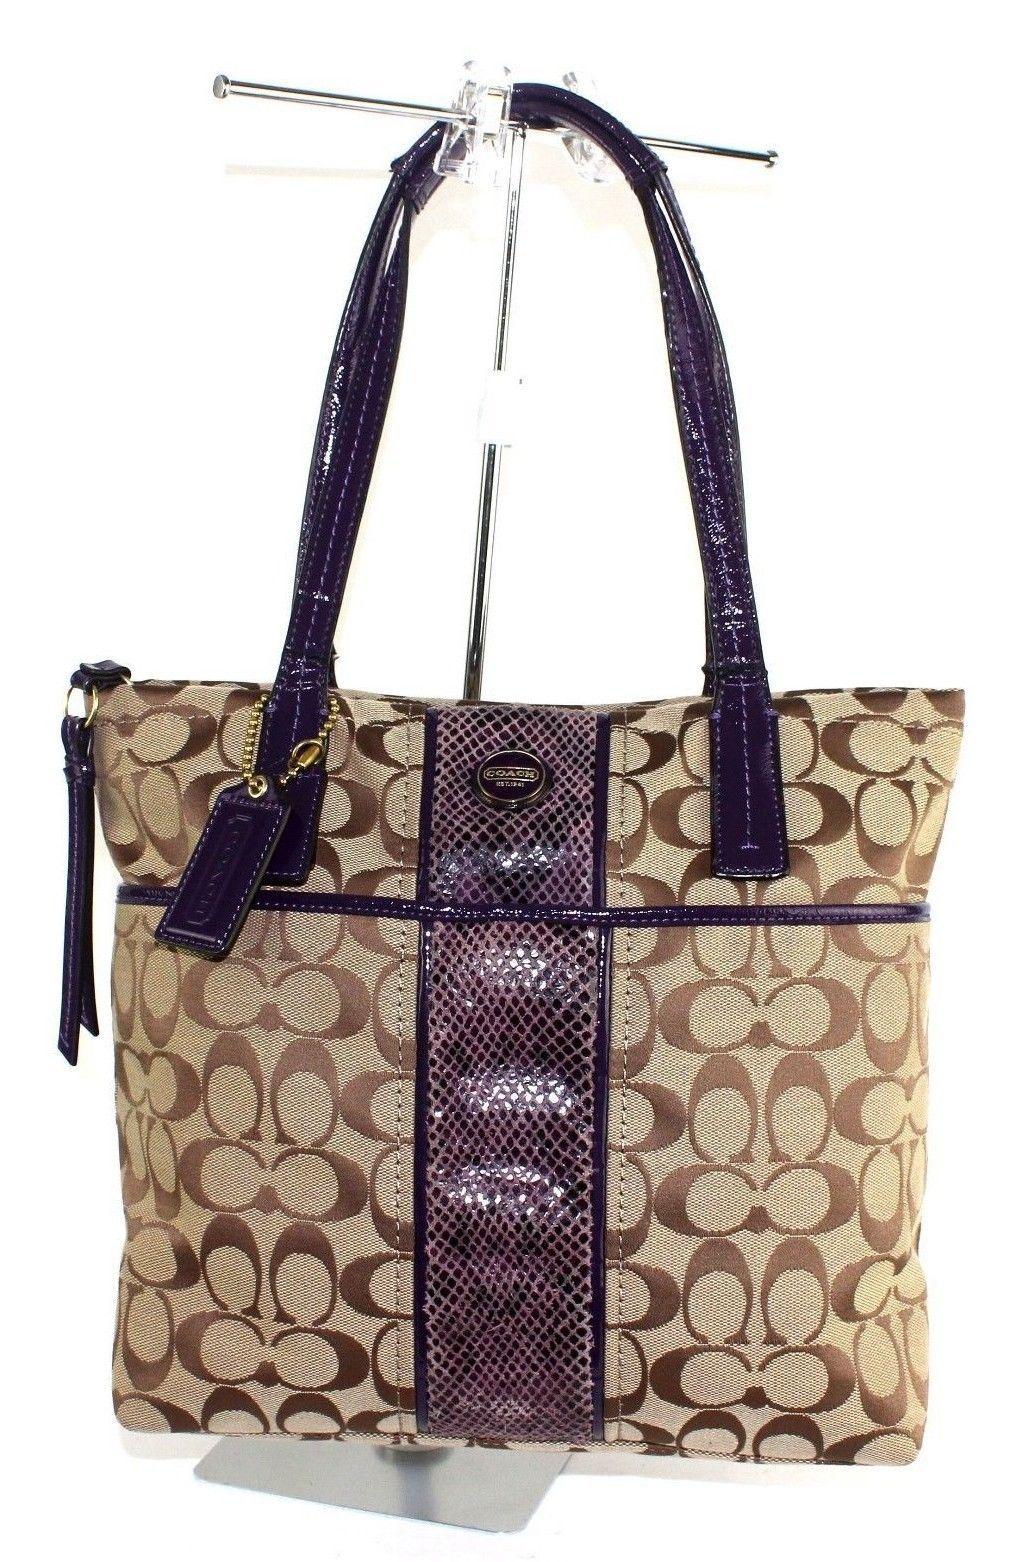 Auth COACH signature Canvas Leather Shoulder Bag purse Beige Purple  F1361-F2570